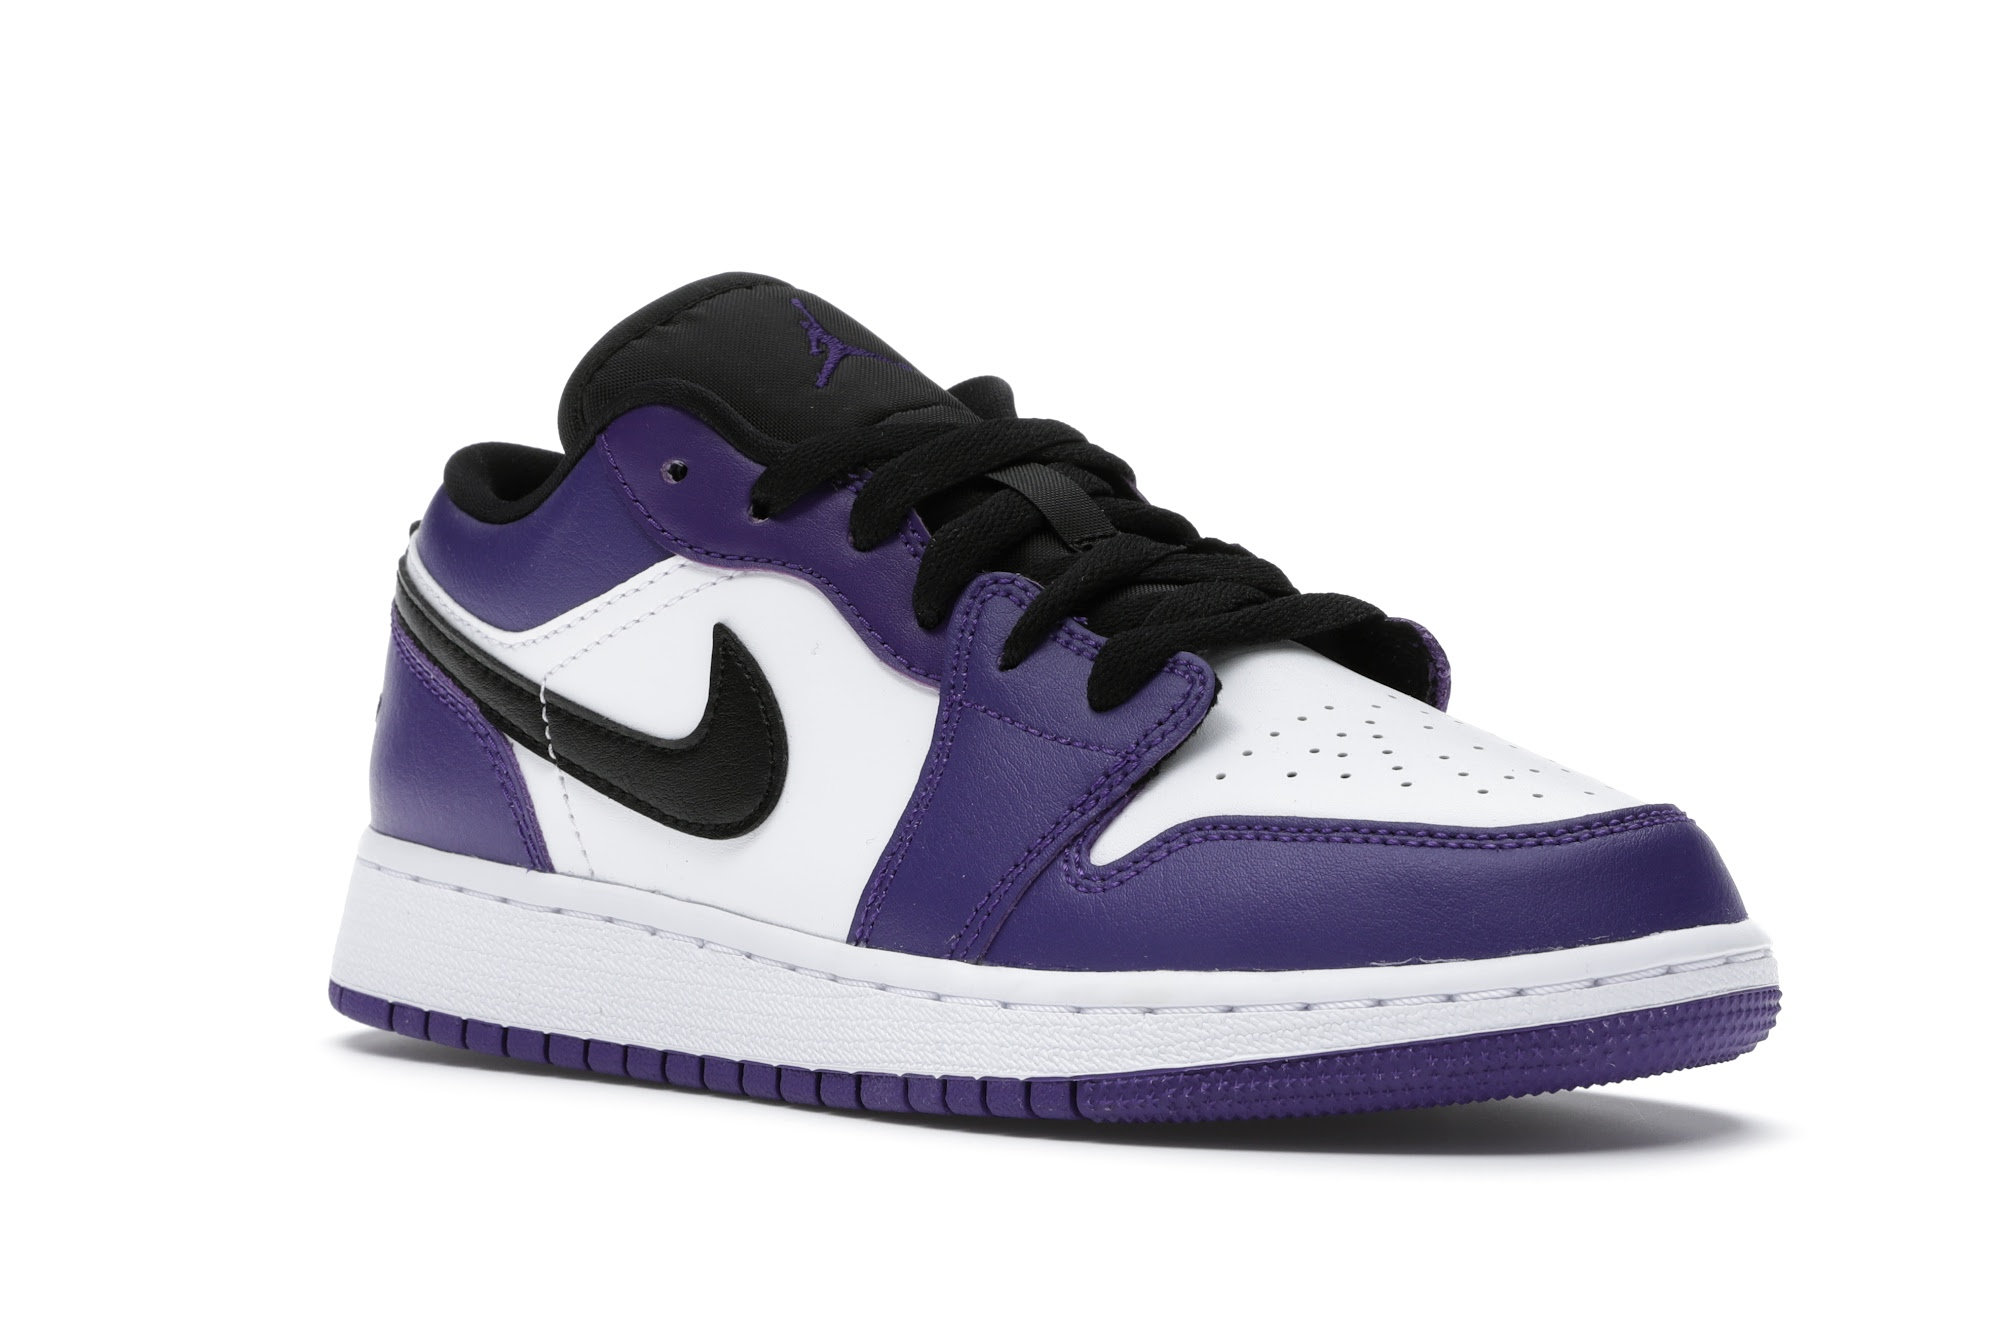 Jordan 1 Low Court Purple White (GS) - 553560-500